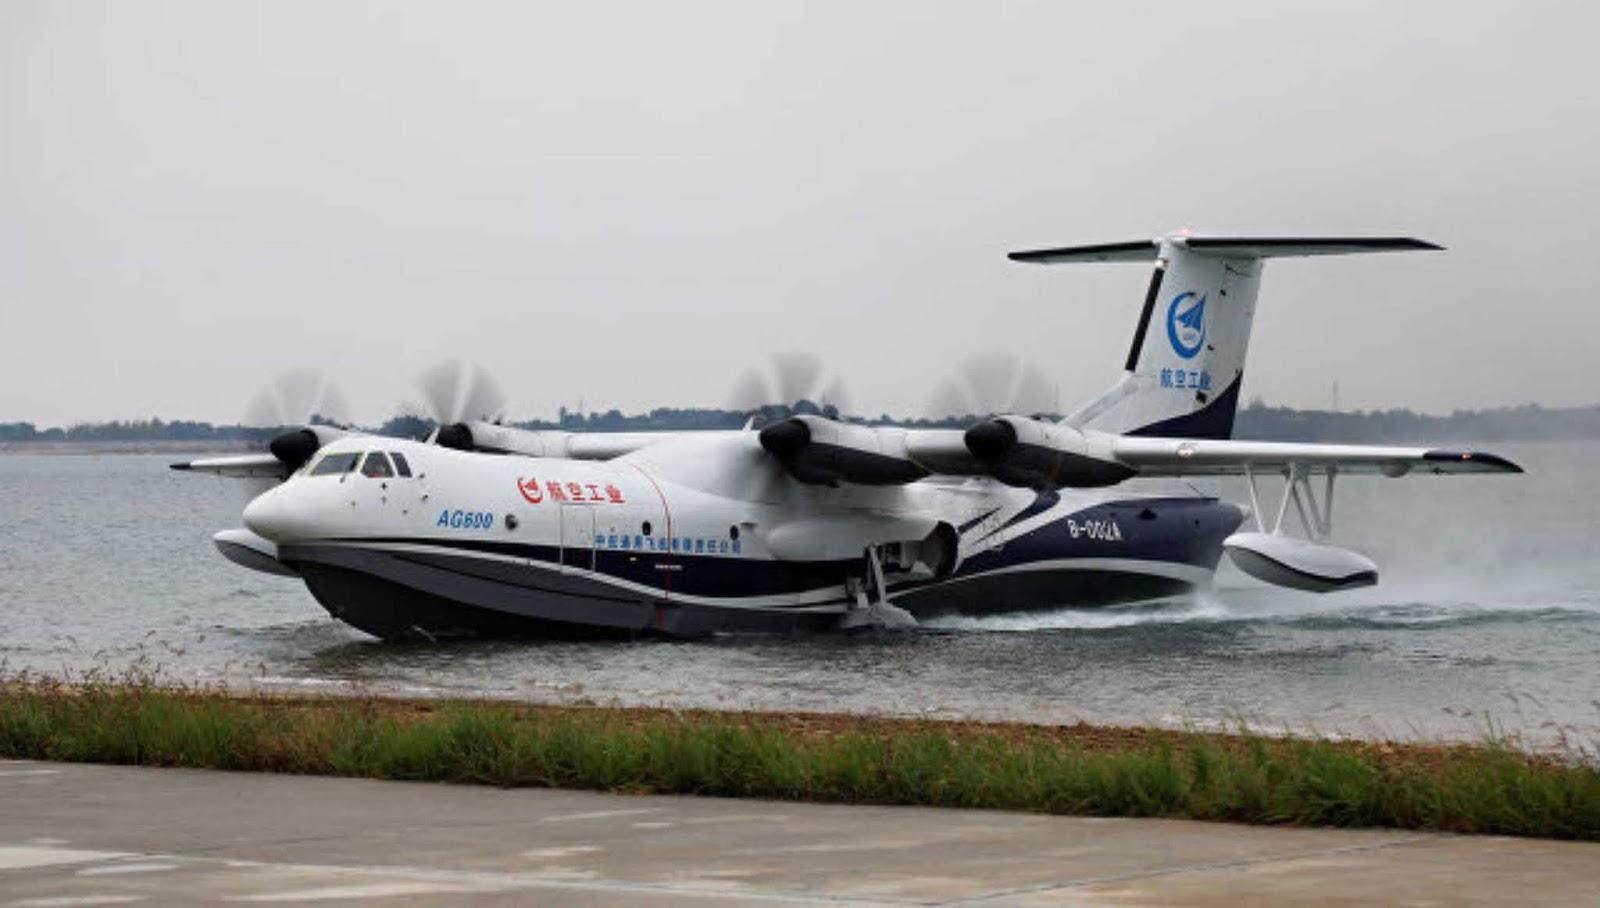 Pesawat Amfibi terbesar di dunia milik Cina melakukan lepas landas pertama dari air